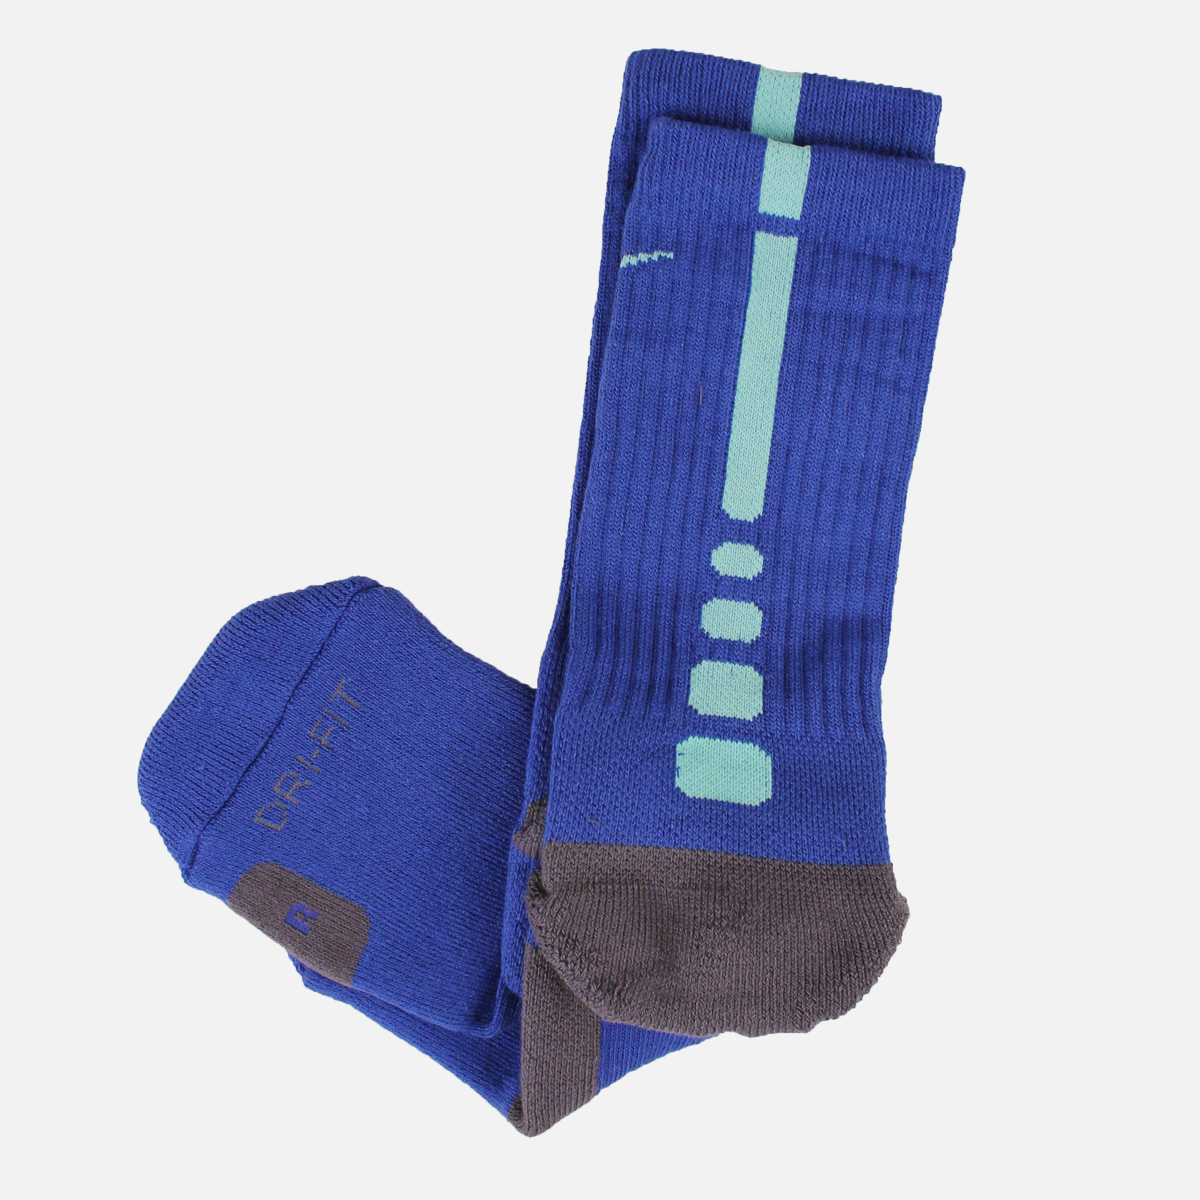 719f67a8d Light Blue Elite Socks - Best Picture Of Blue Imageve.Org